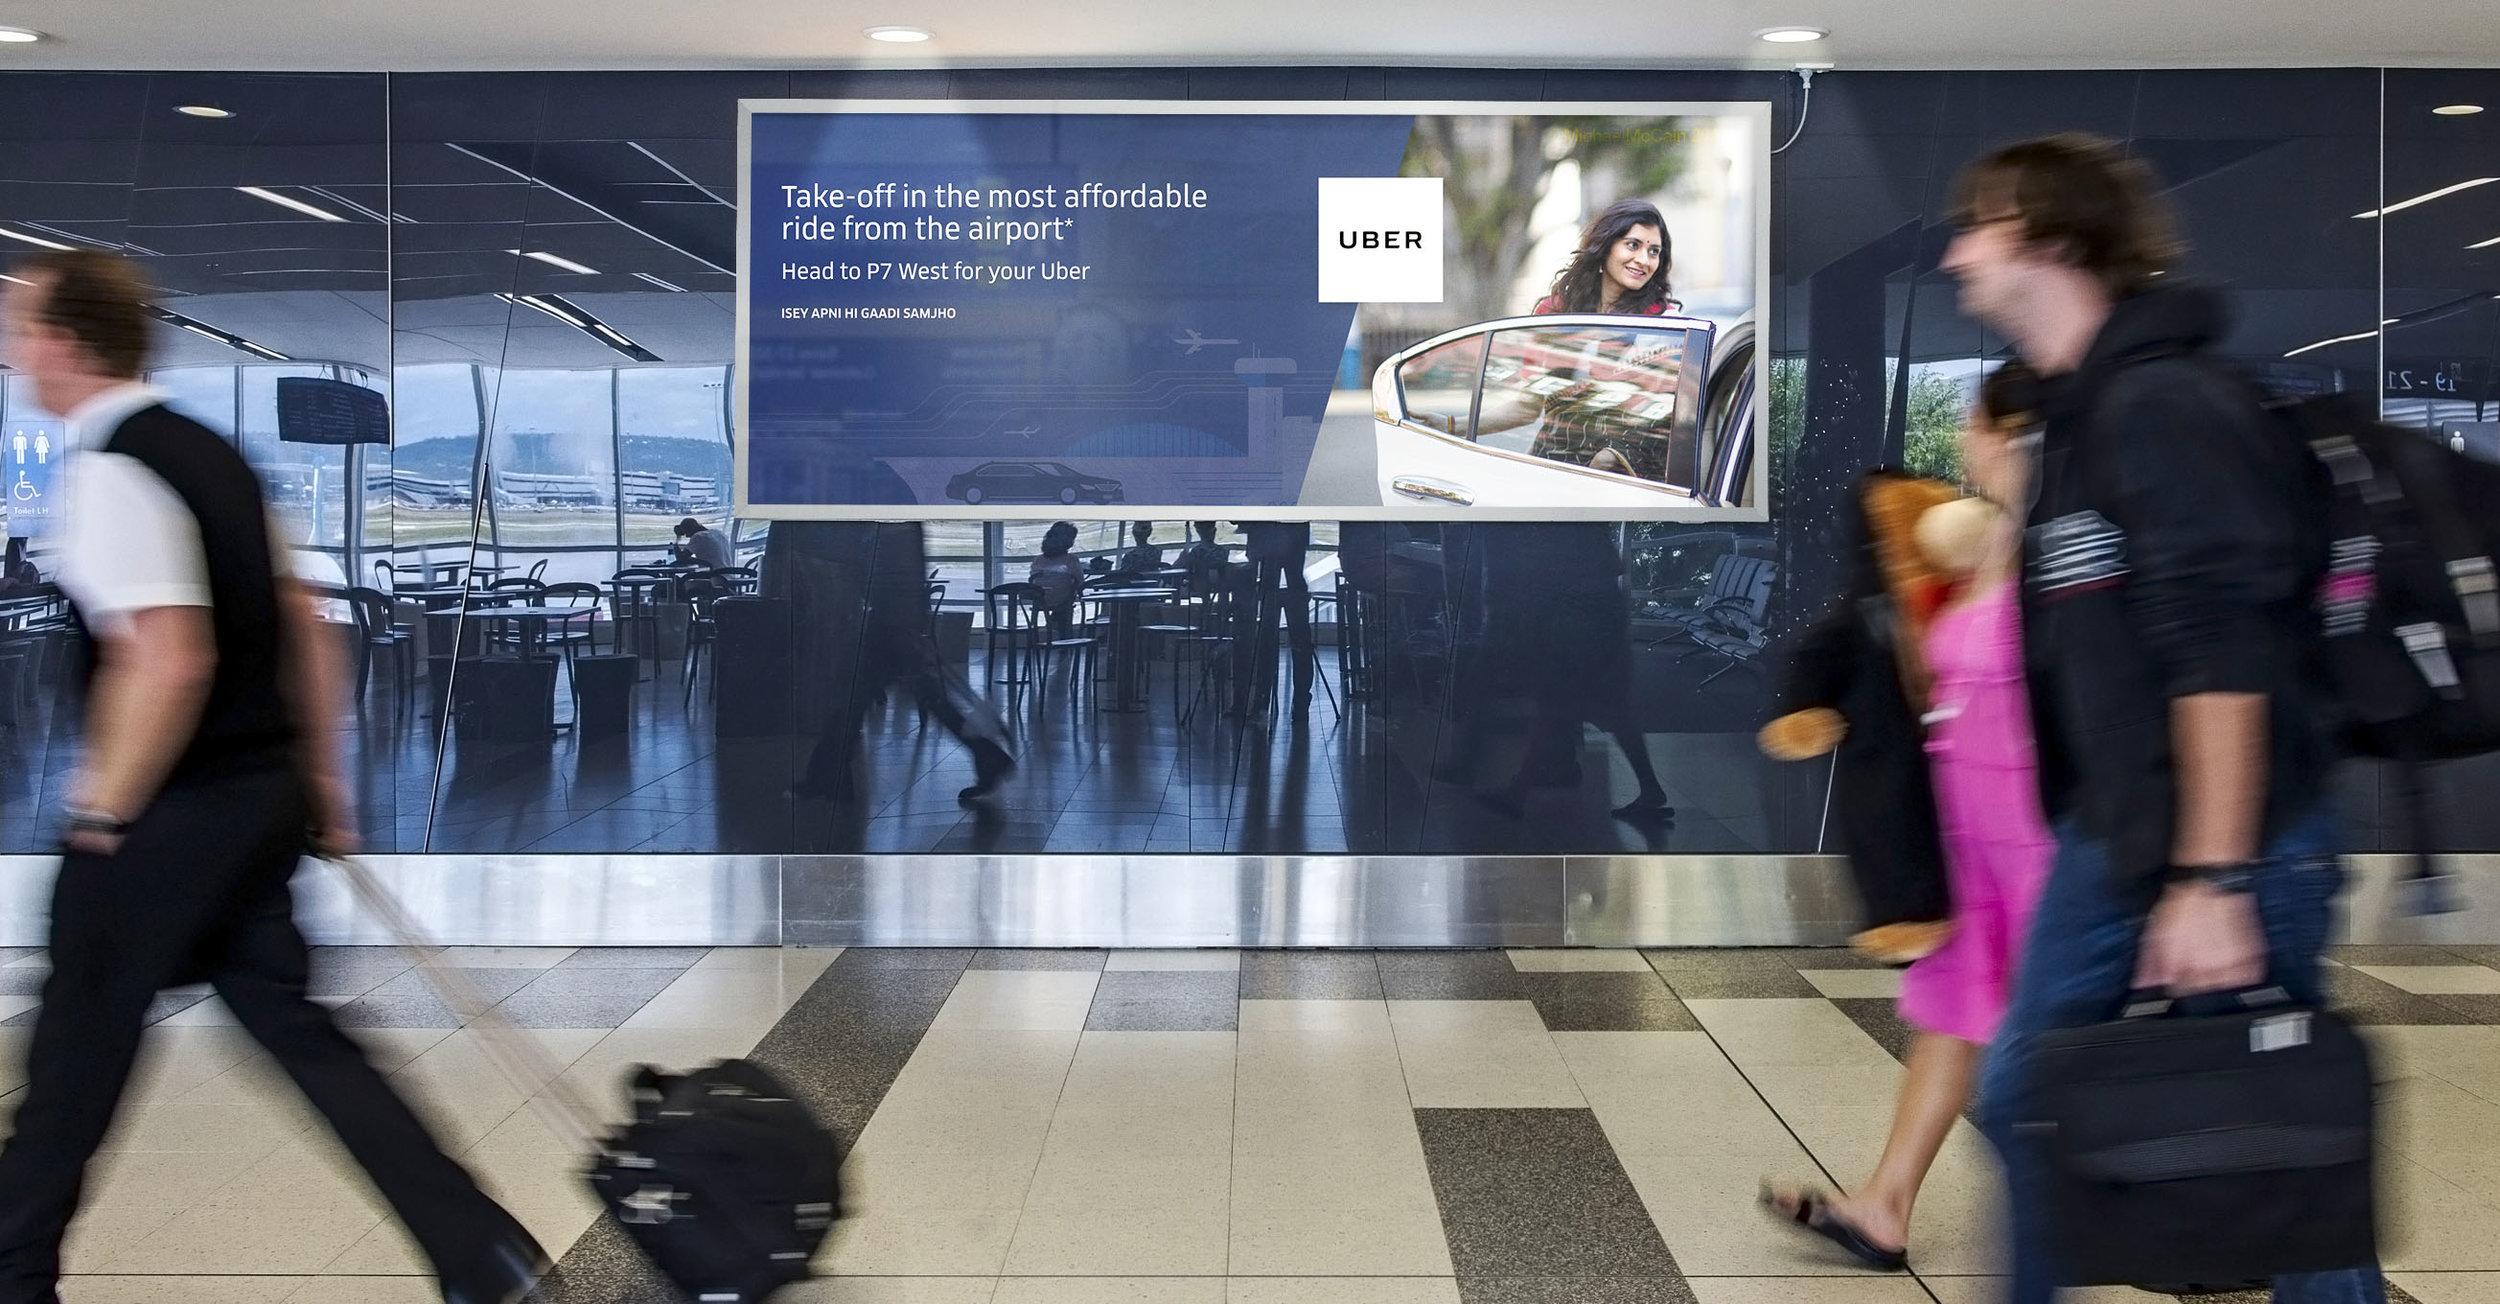 airport billboard.jpg